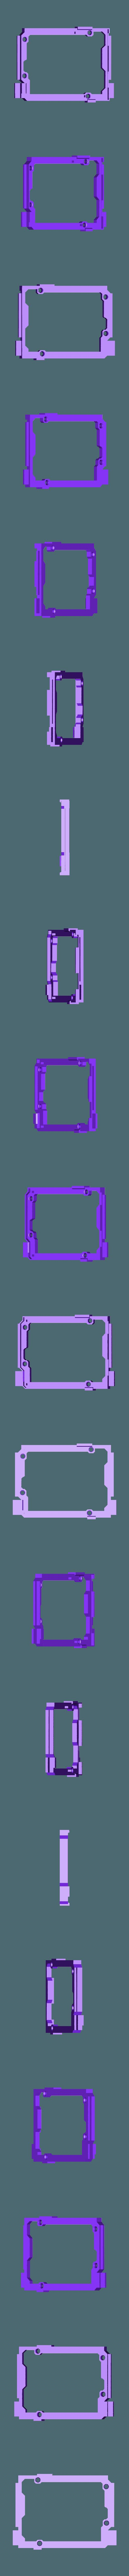 Tray.stl Download free STL file Arduino Uno Slider w/ 2x16 LCD • Design to 3D print, NHiggs